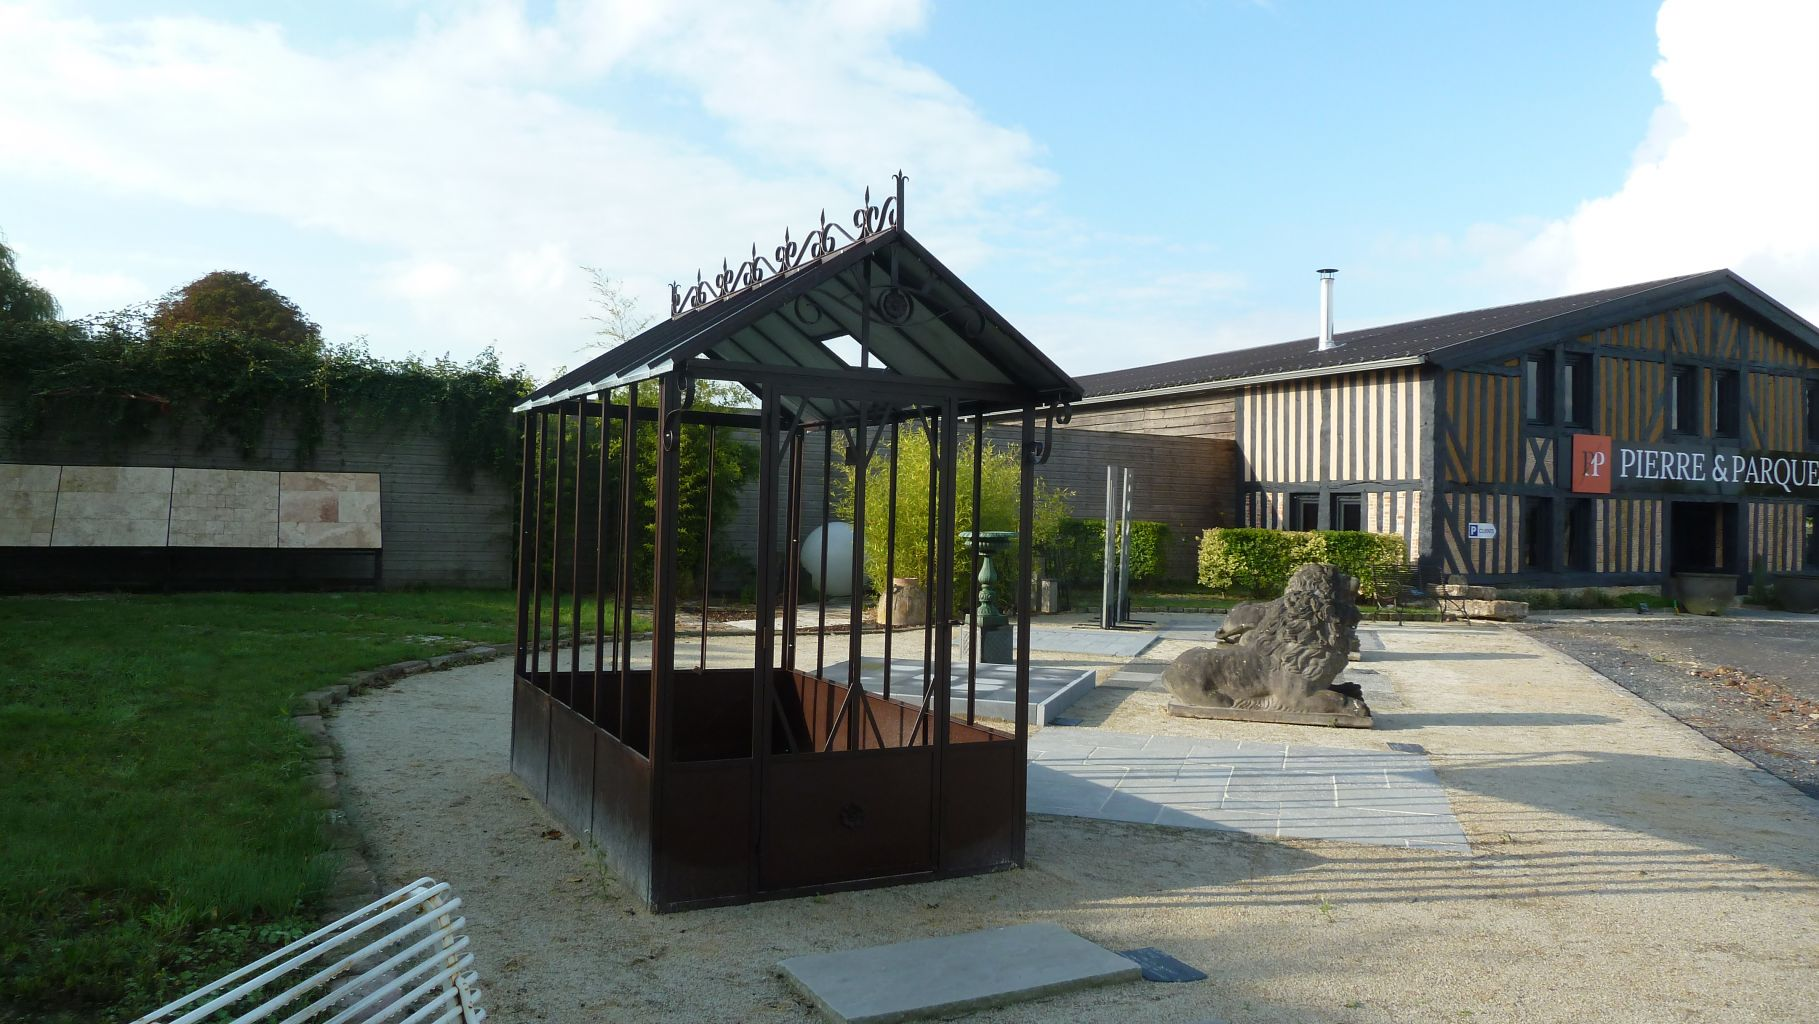 Serre de jardin l 39 ancienne fer forg bca mat riaux for Serre de jardin ancienne